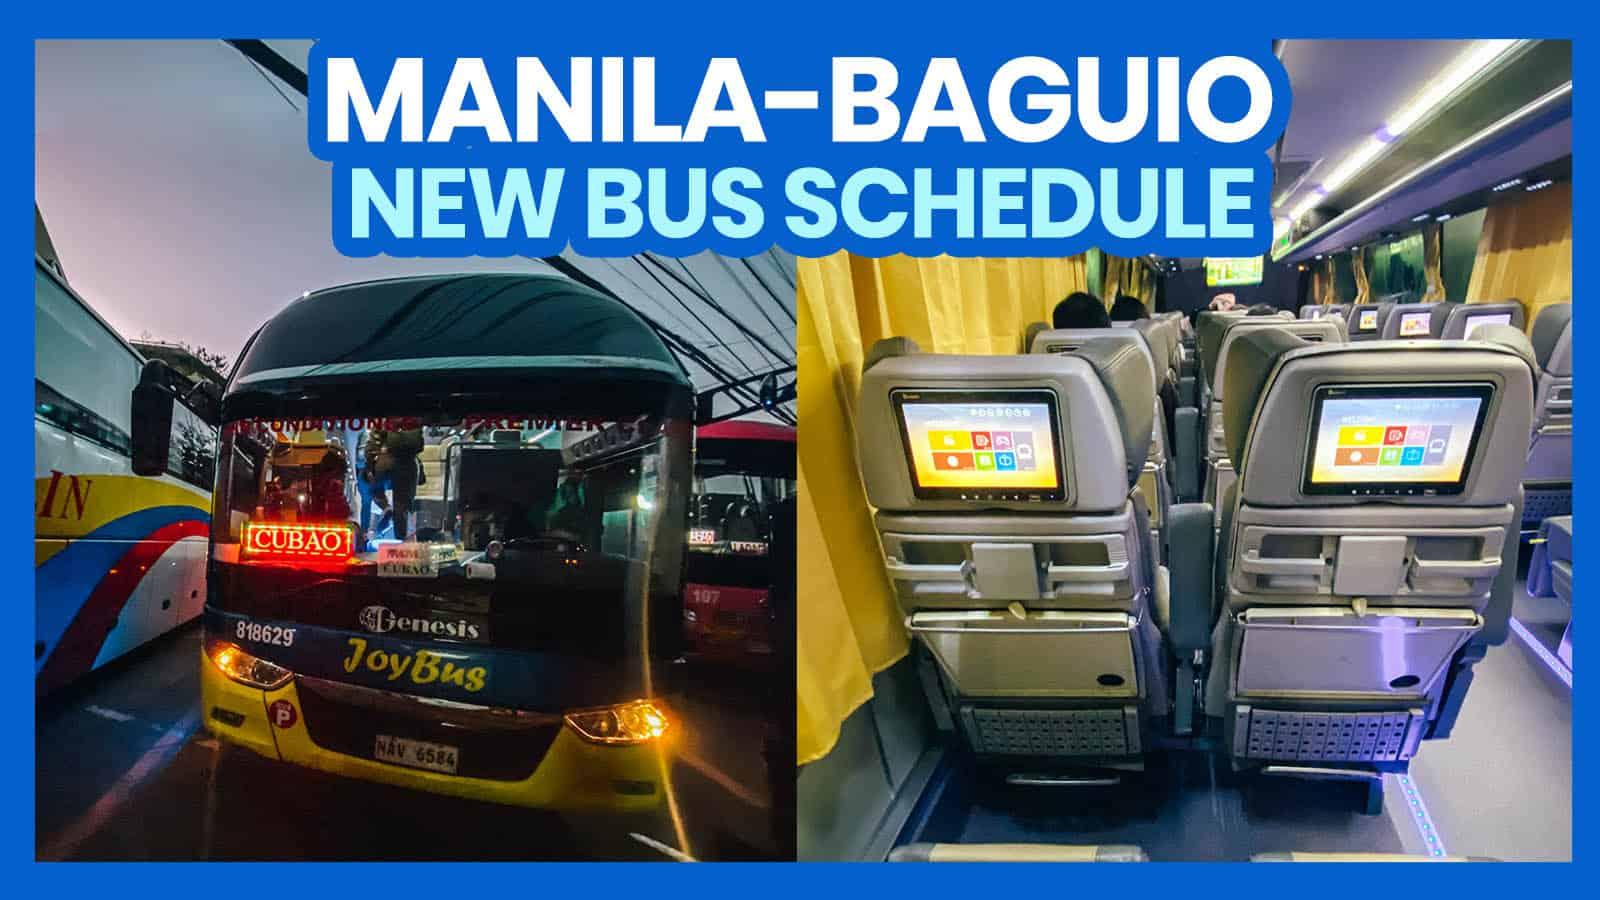 2021 MANILA TO BAGUIO TO MANILA BUS SCHEDULE: Victory Liner, Genesis & JoyBus